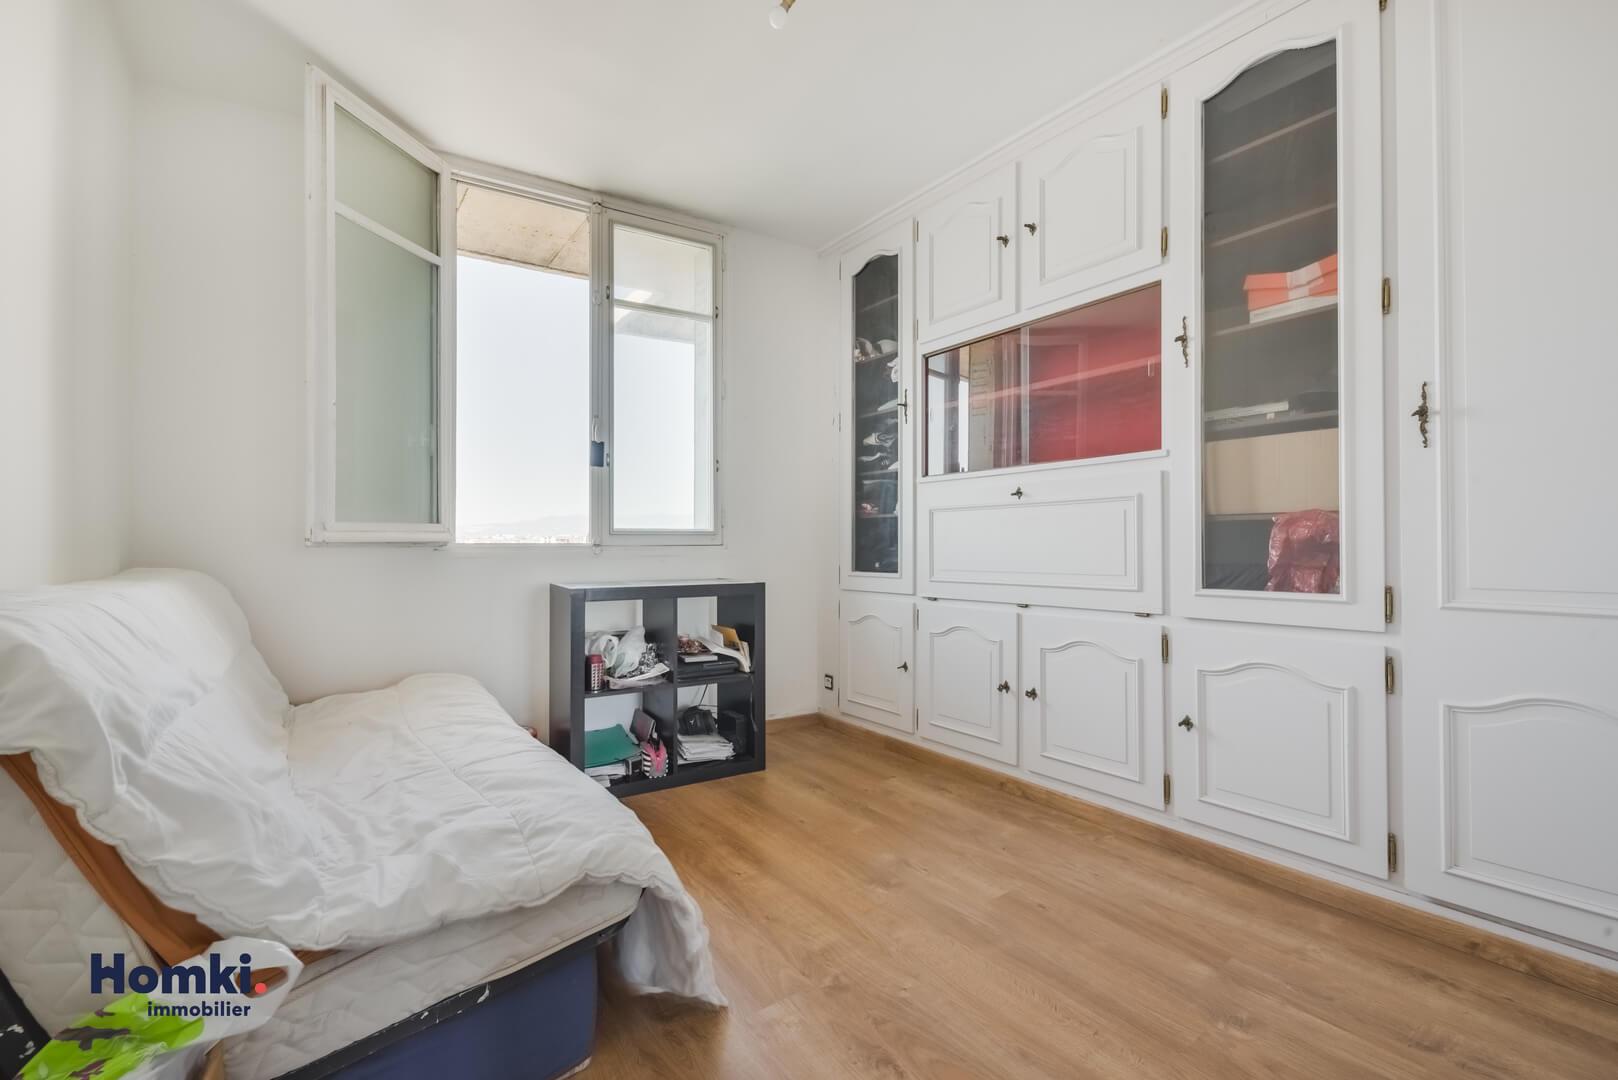 Vente appartement Marseille T3 13006 Castellane Prado_6